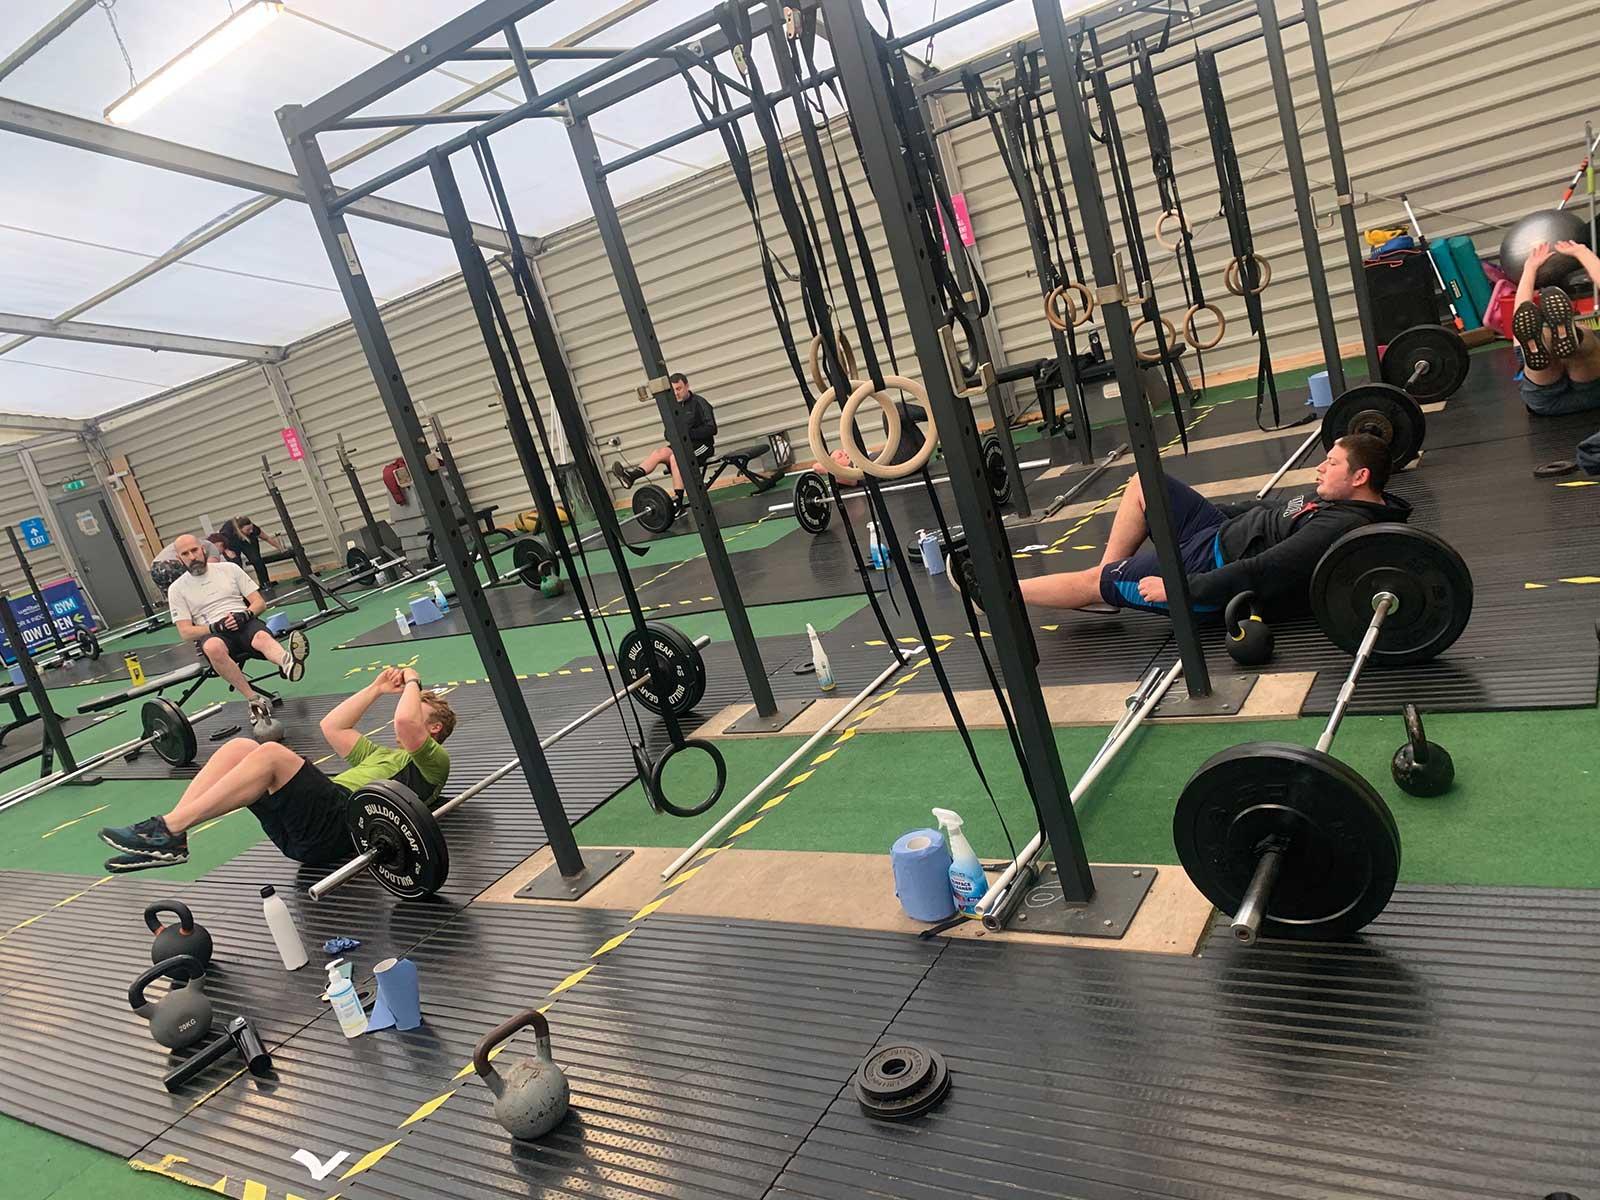 Wellbeing Gym & Personal Training Studio